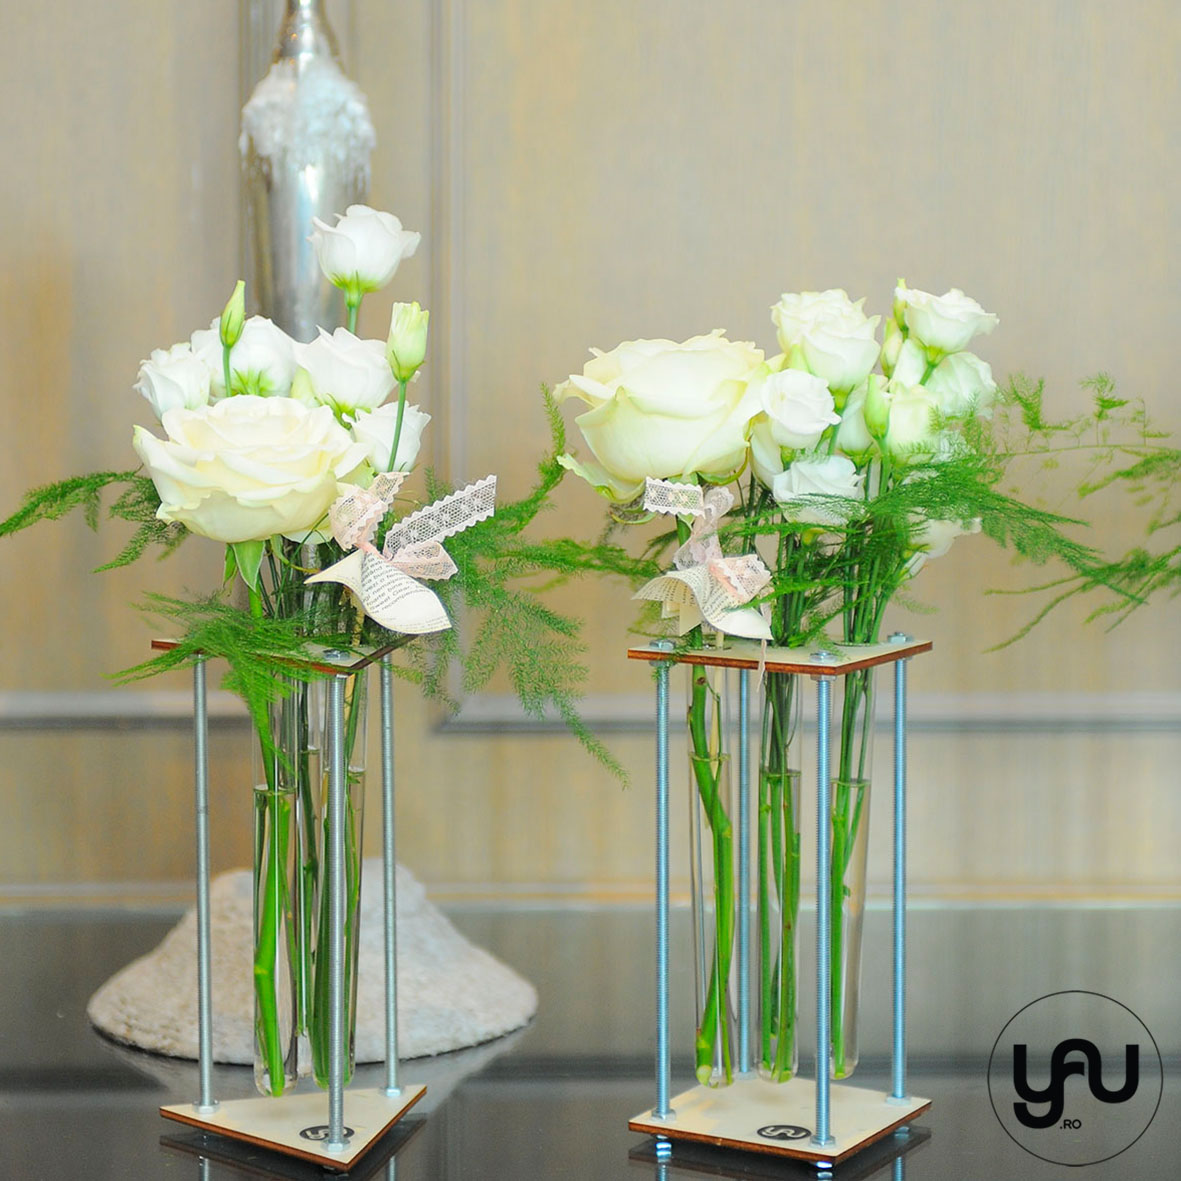 YaU events 2015 _ YaU Concept elena toader _ WHITE GEOMETRY _ BOTEZ LA CLUBUL DIPLOMATILOR (7)